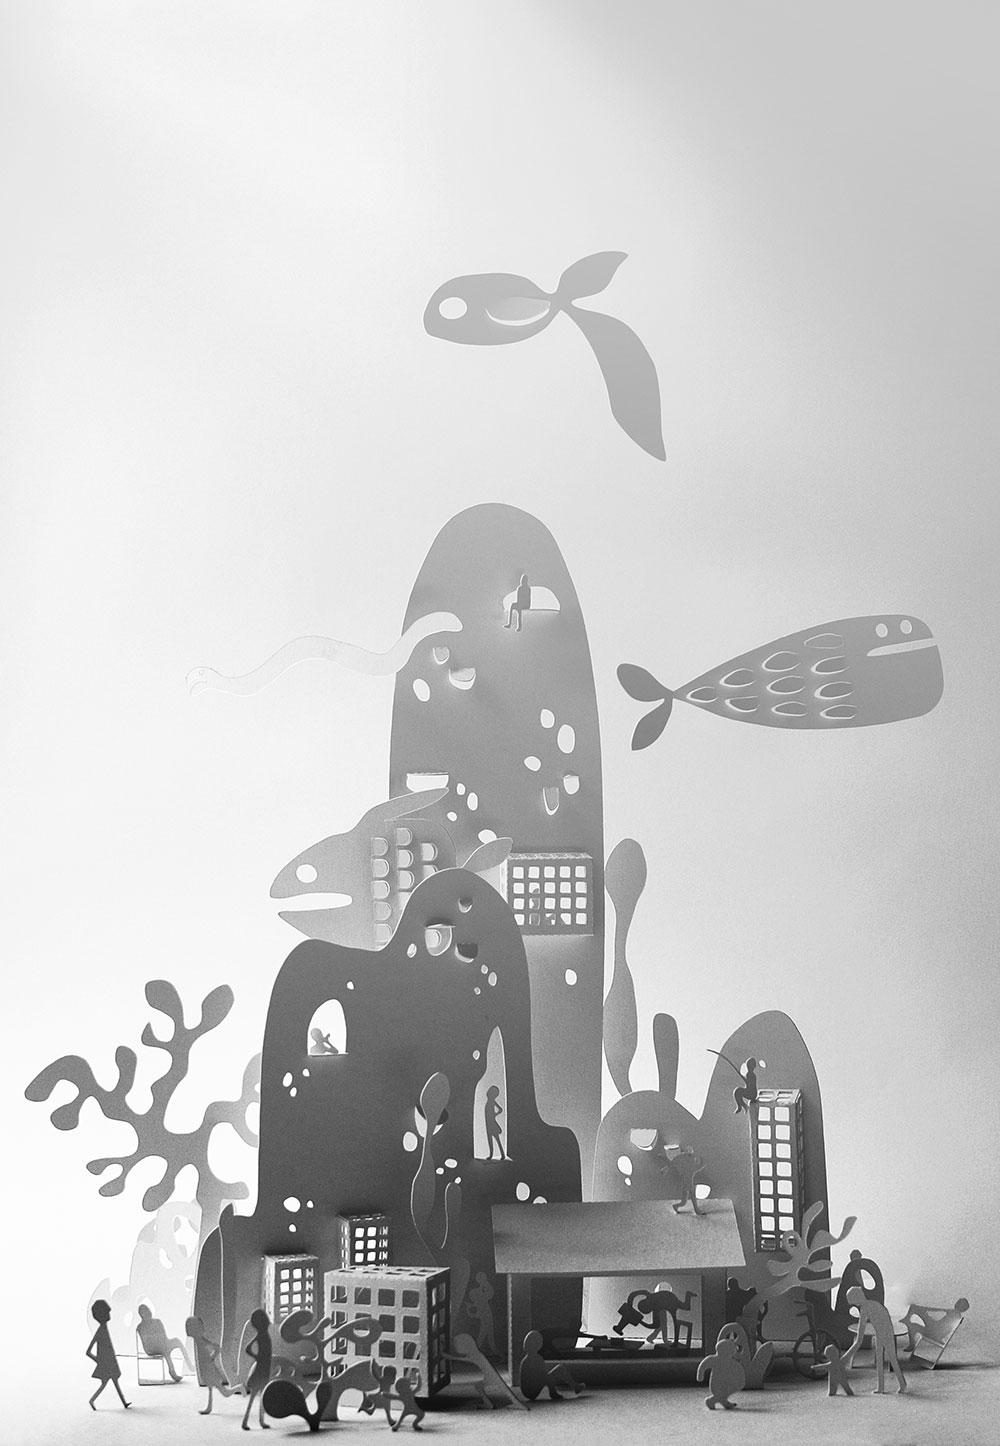 Arquitectura-Papel-Ciudad-agua-Volandera.jpg